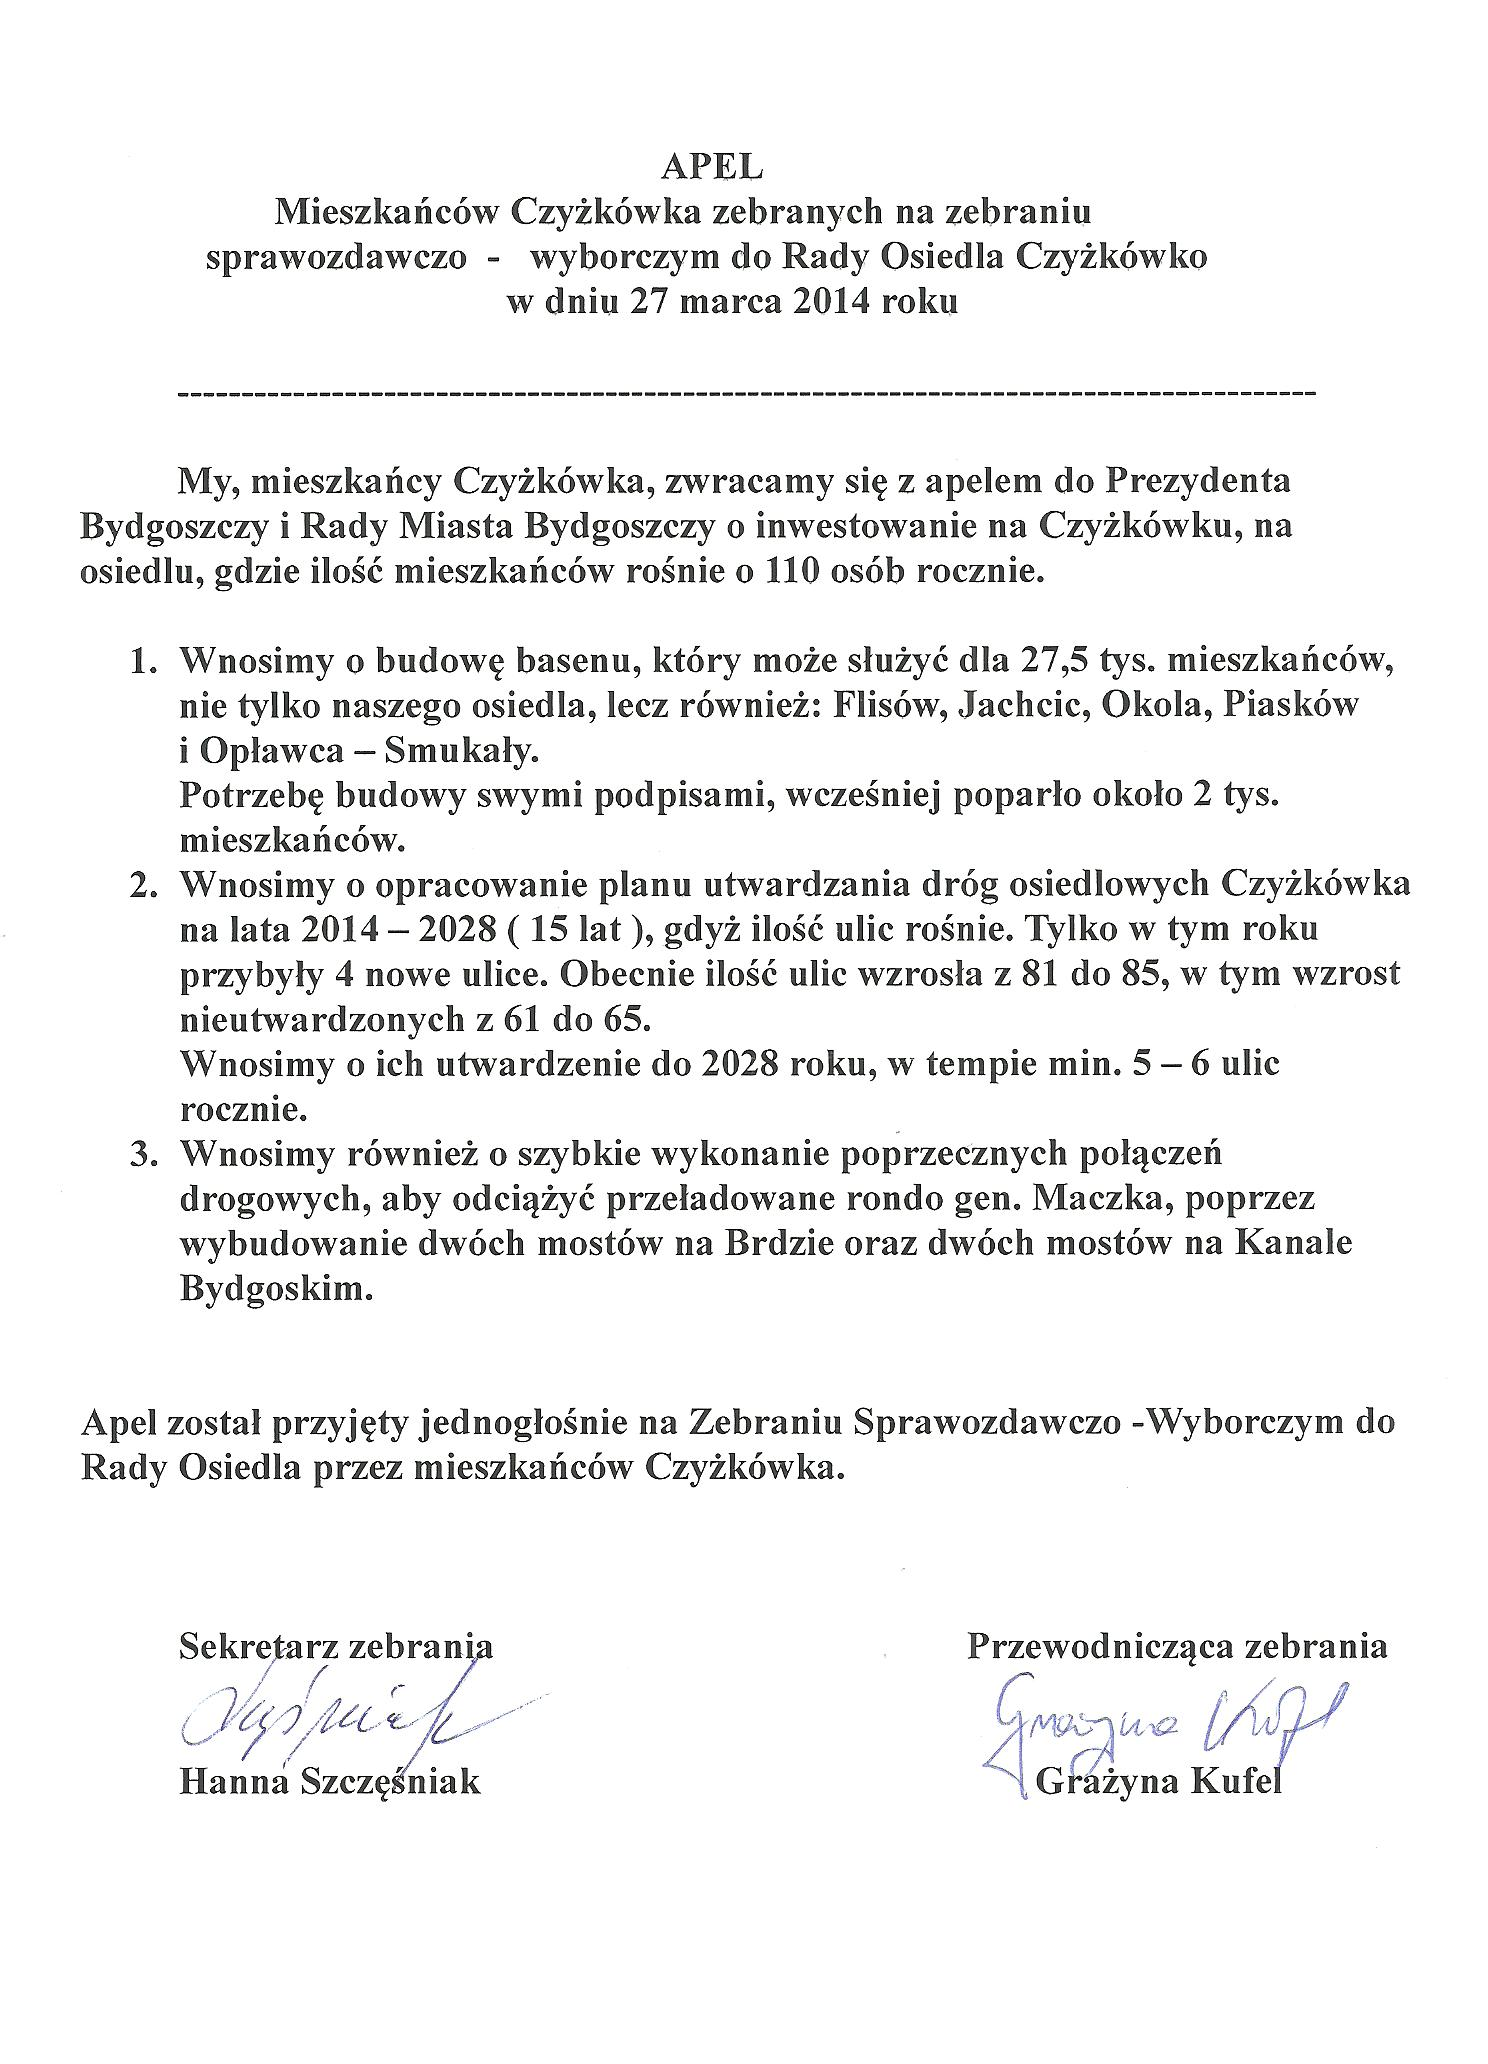 RO info Apel